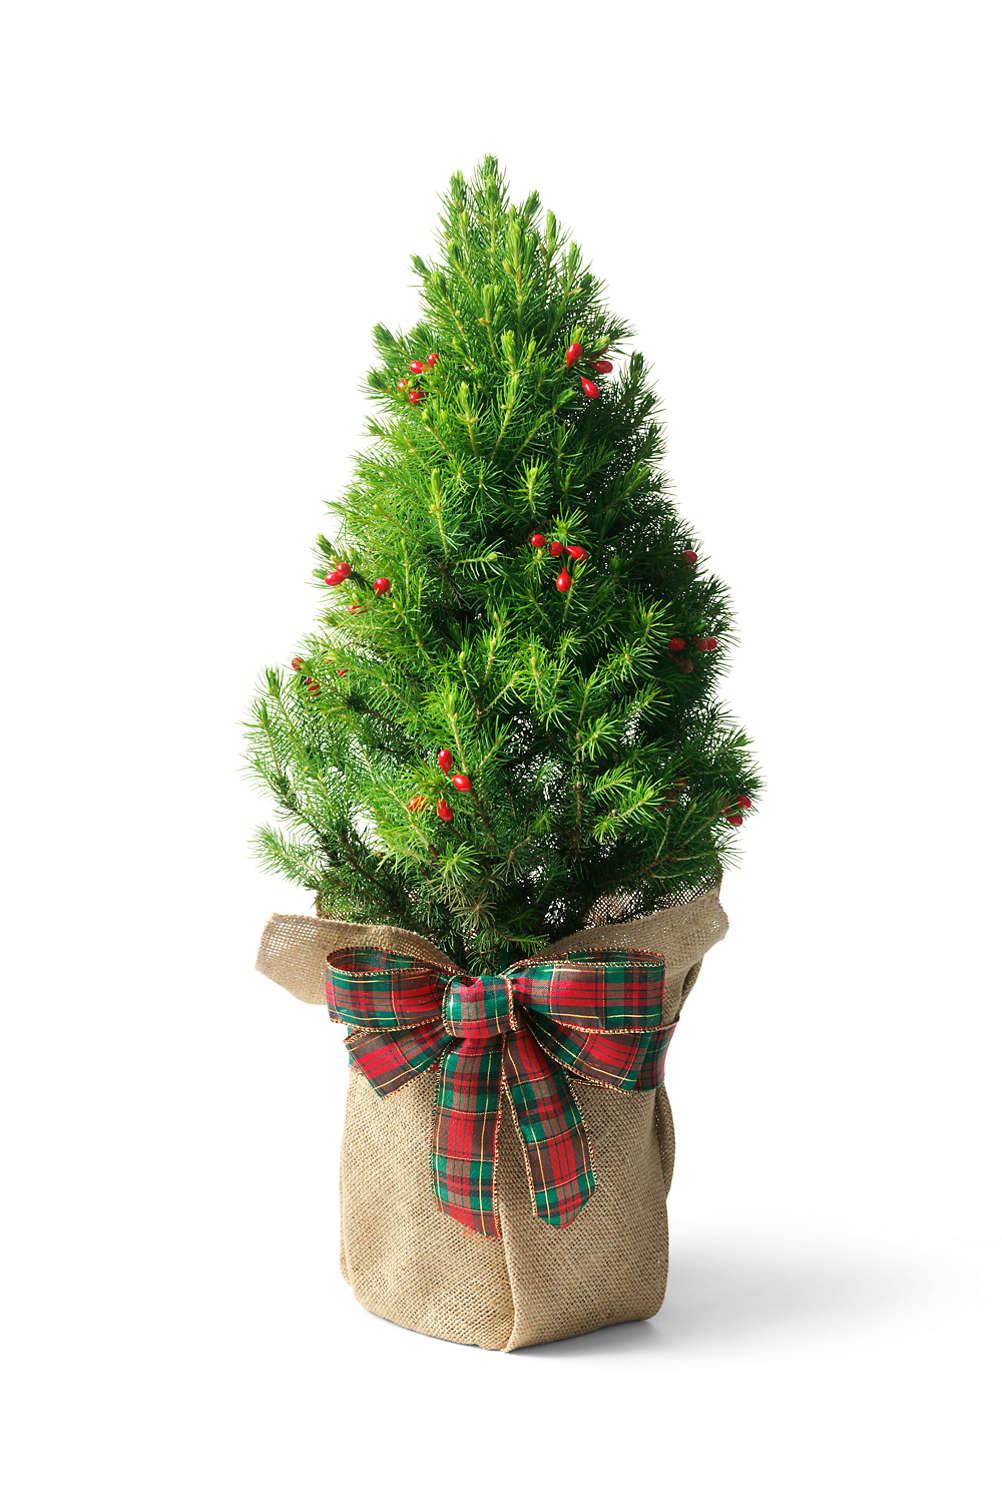 dwarf alberta spruce mini christmas tree from lands end - Mini Real Christmas Tree